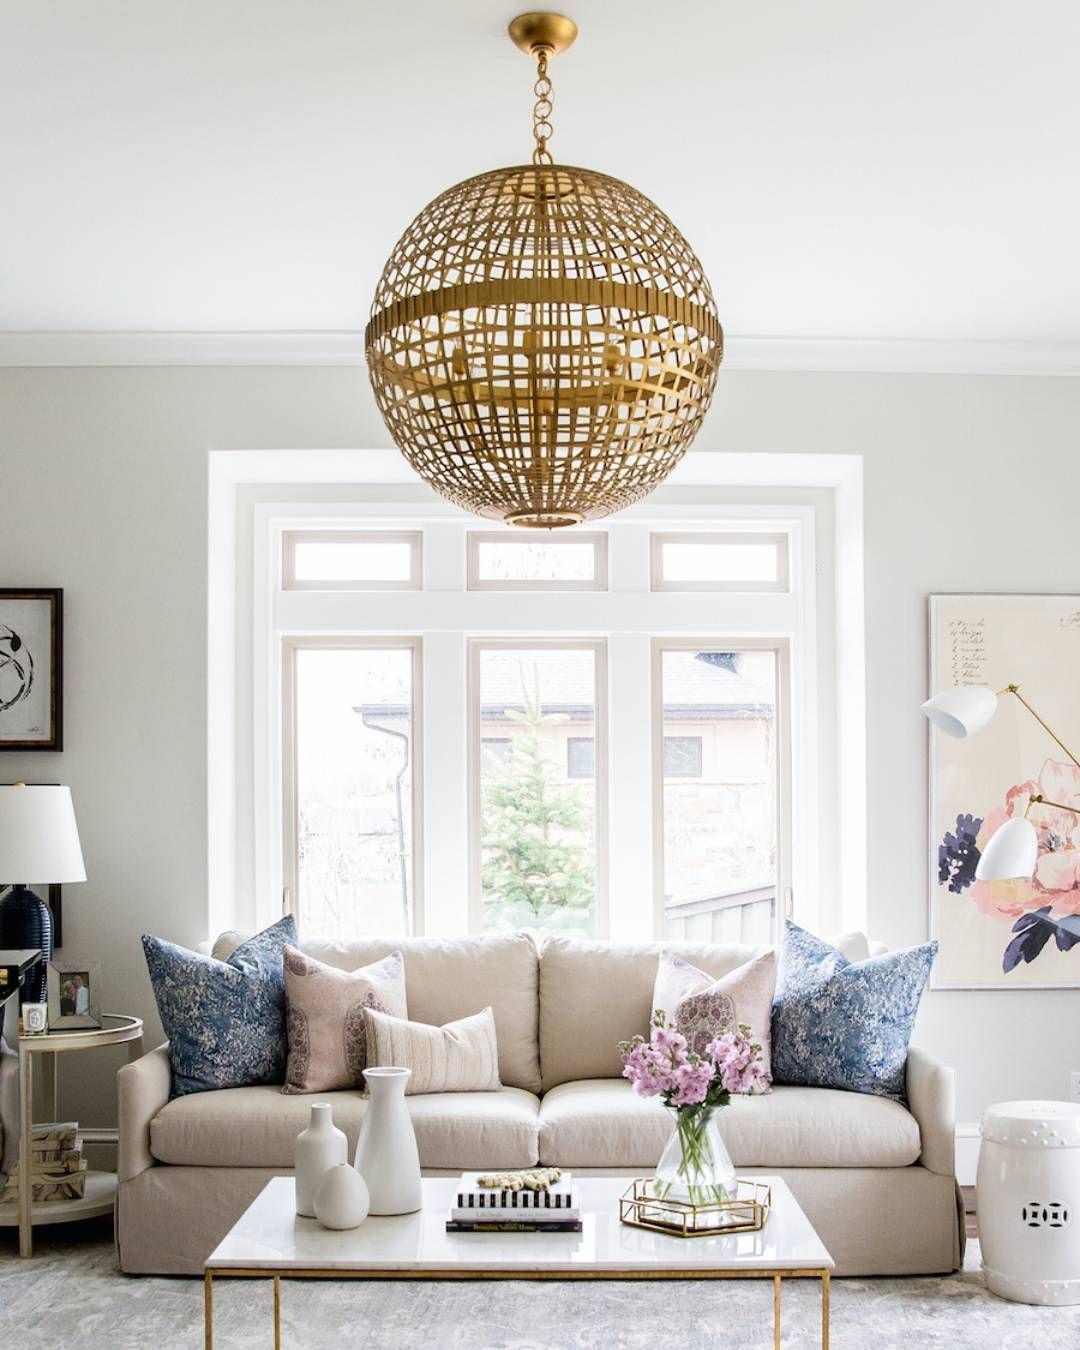 Pin by Kati C on Home Interior Design | Pinterest | Pastel living ...